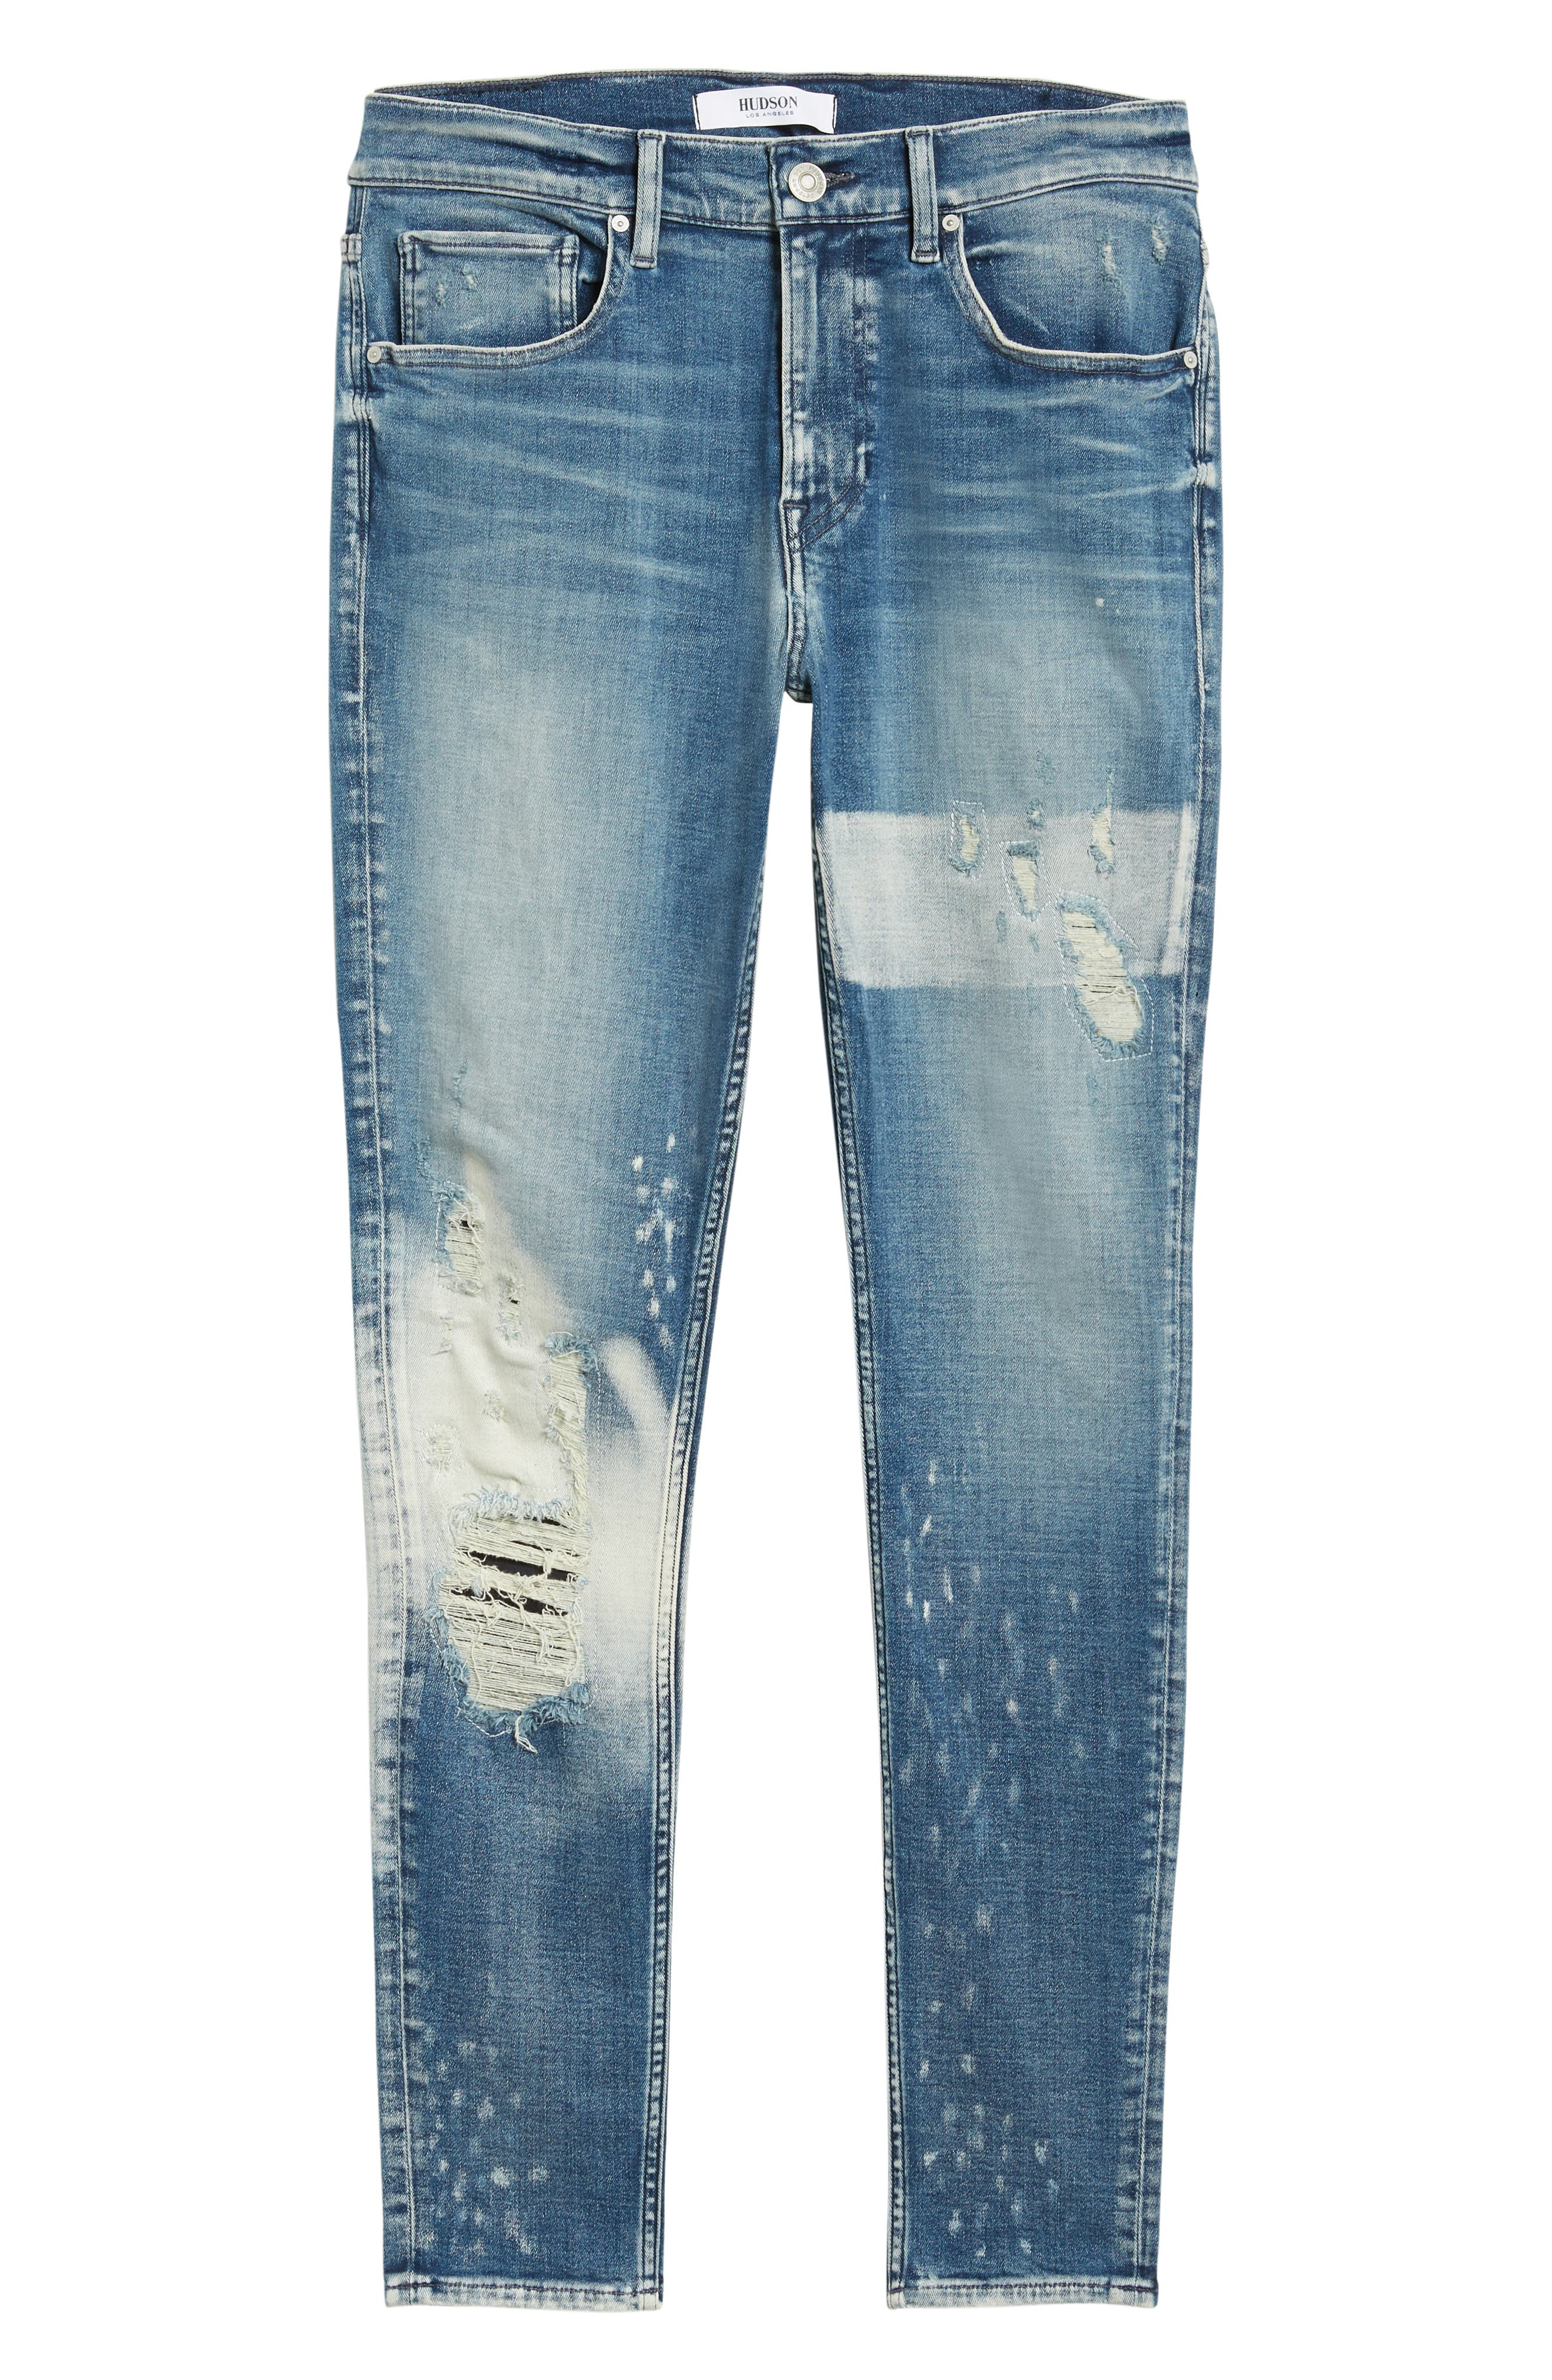 Zack Skinny Fit Jeans,                             Alternate thumbnail 6, color,                             MCNAB